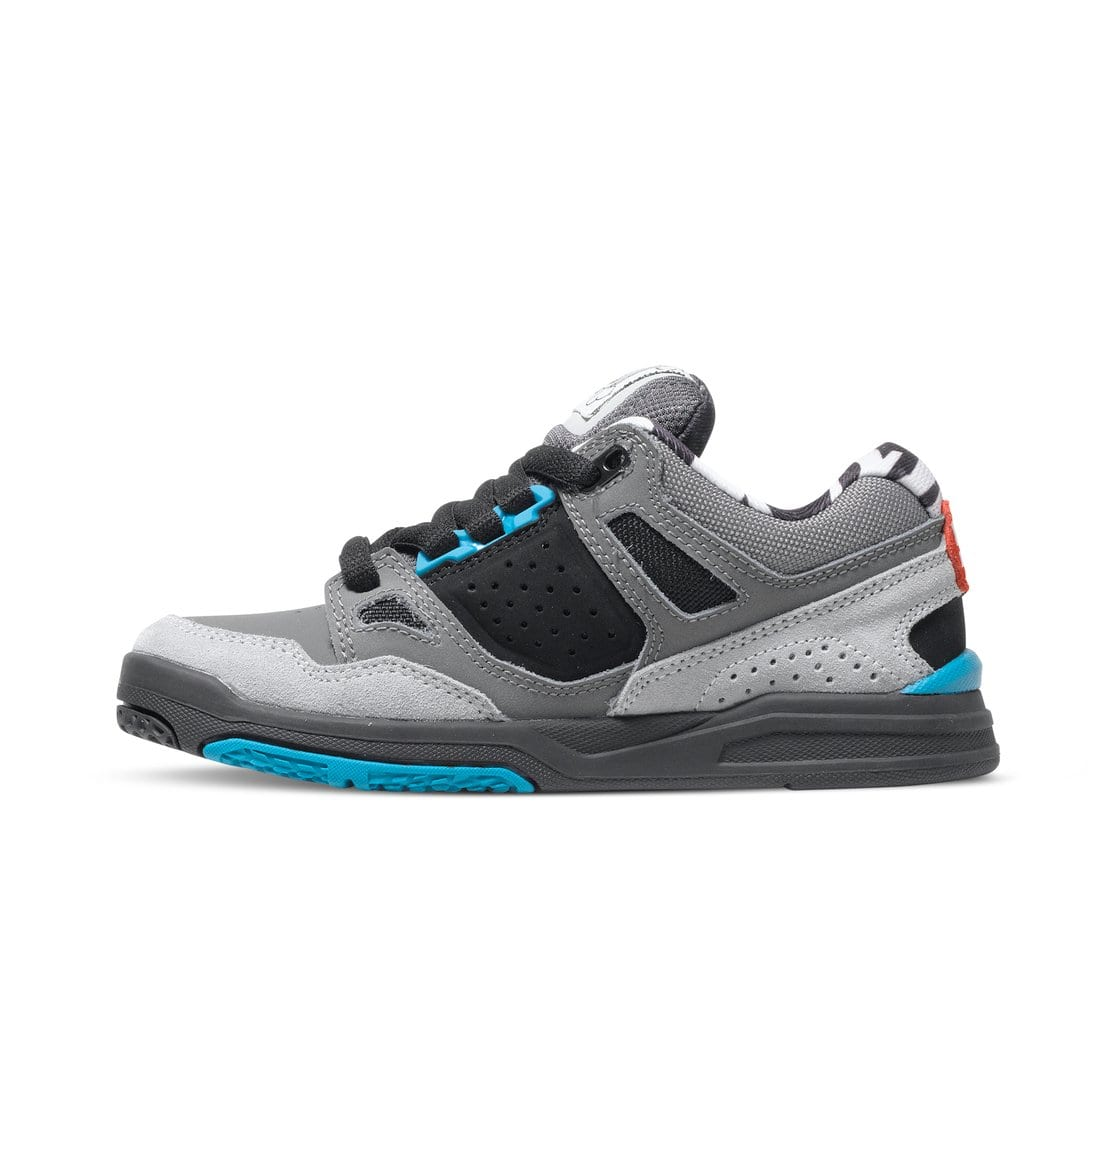 100% authentic f605f 3001d DC Shoes : Stag 2 Ken Block – Cyan/Black   o-zone shop